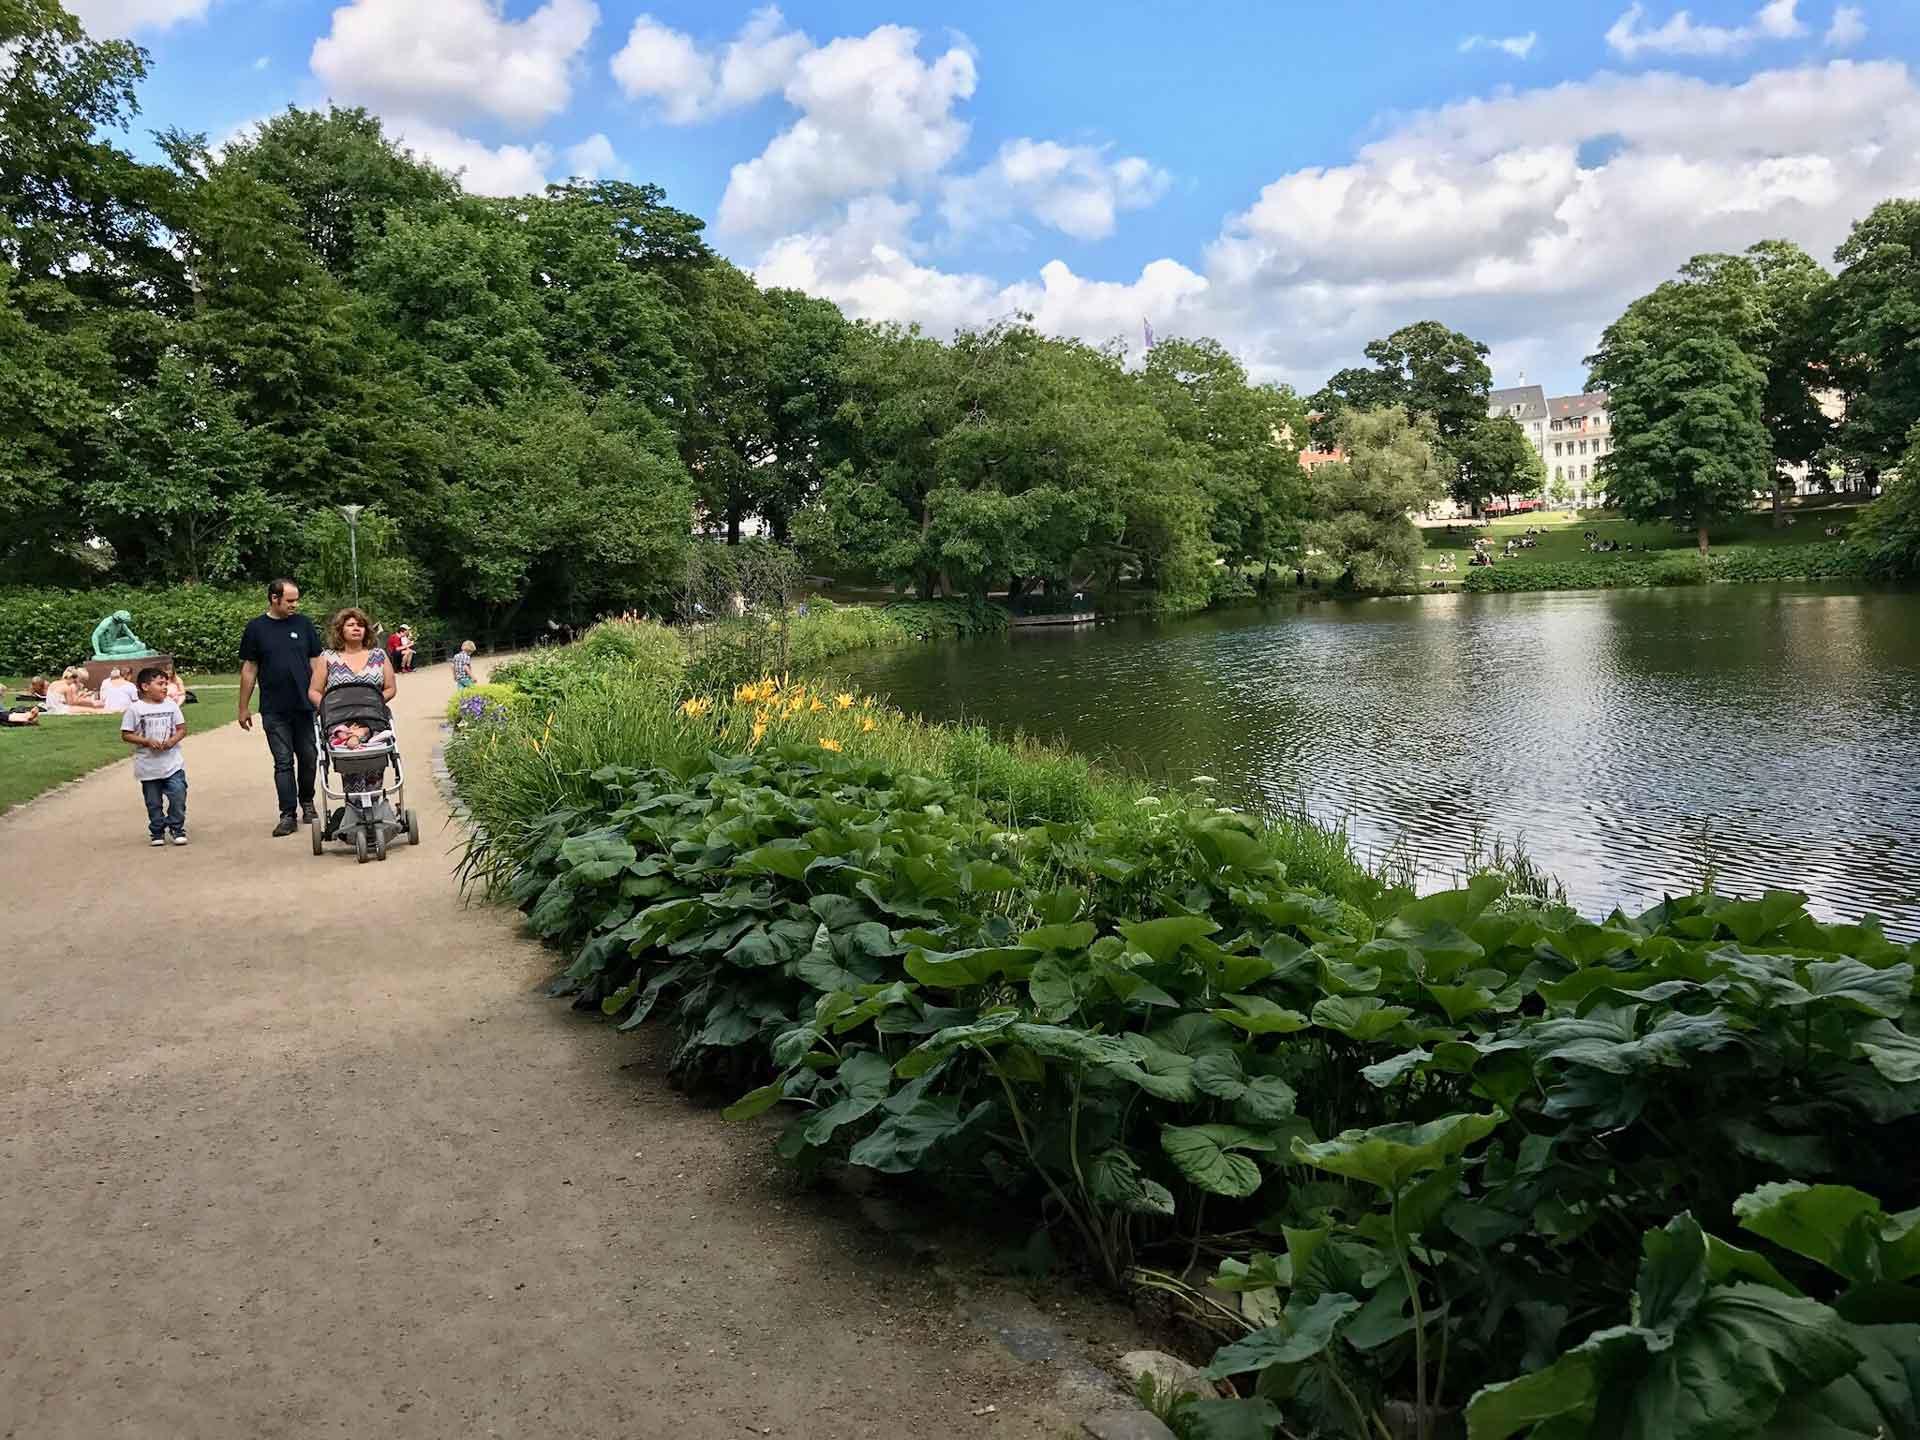 Ørstedsparken Copenhagen with a stroller